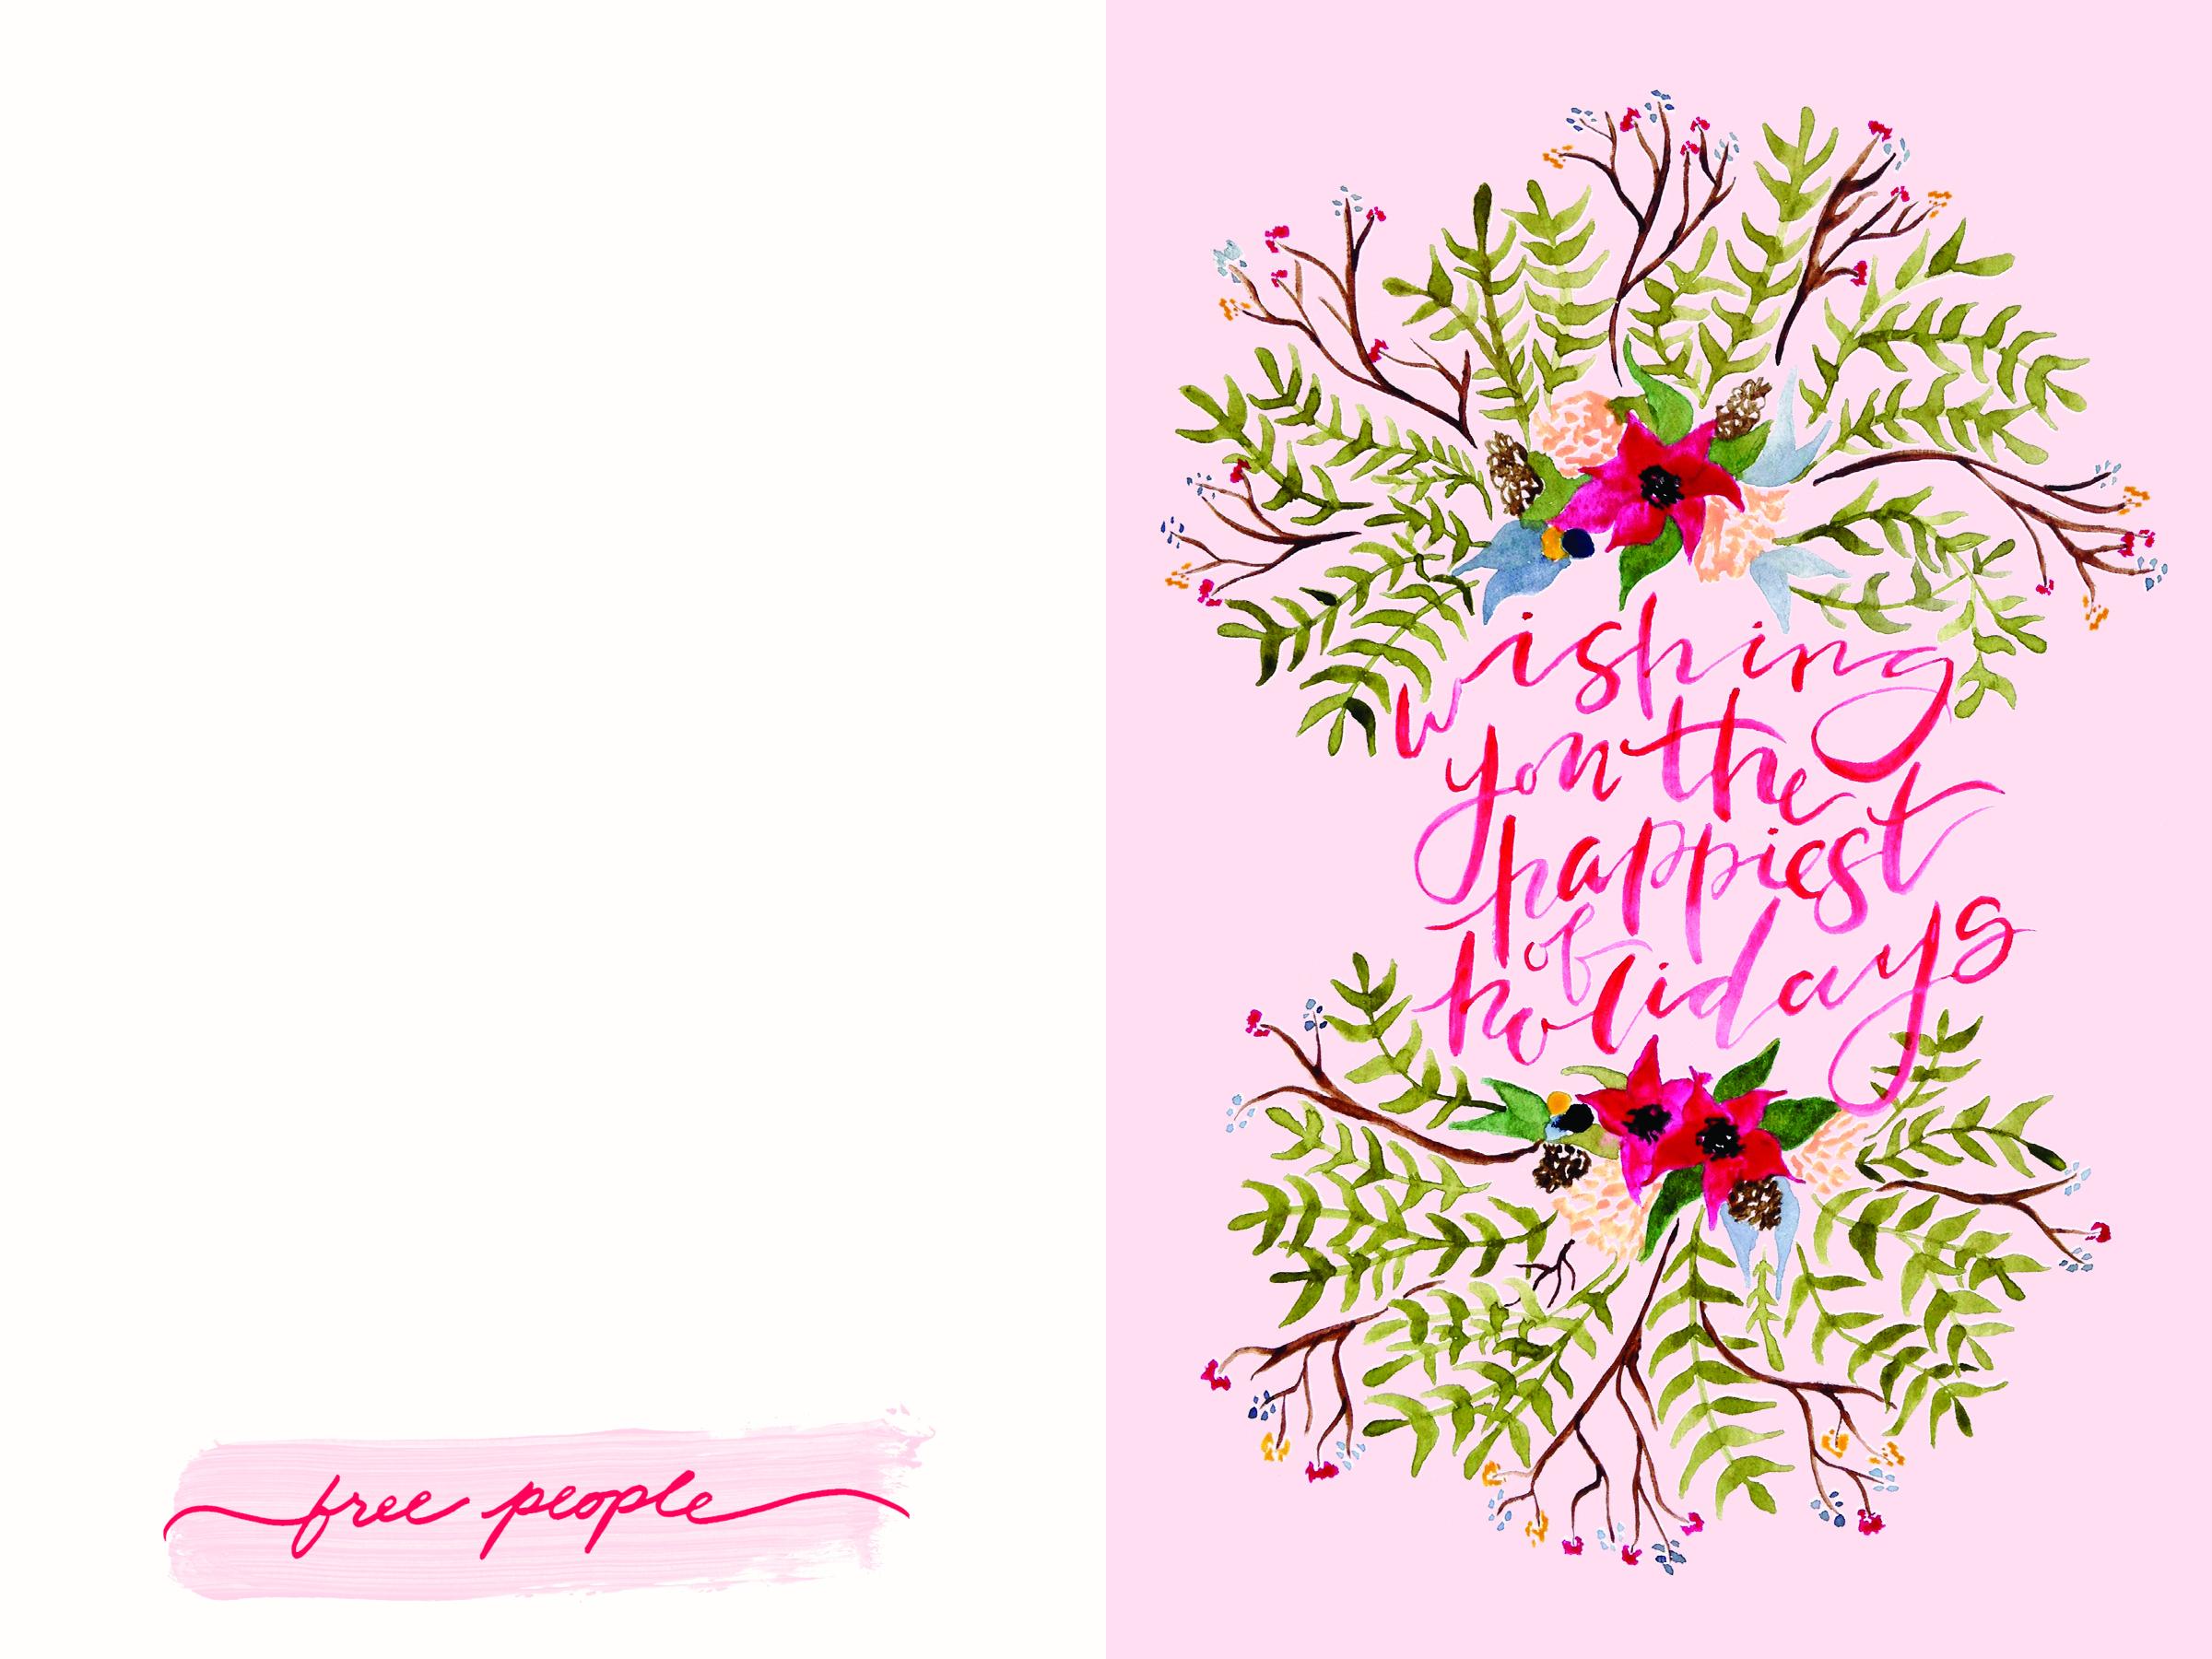 Free Printable Christmas Cards   Website - Free Printable Happy Holidays Greeting Cards